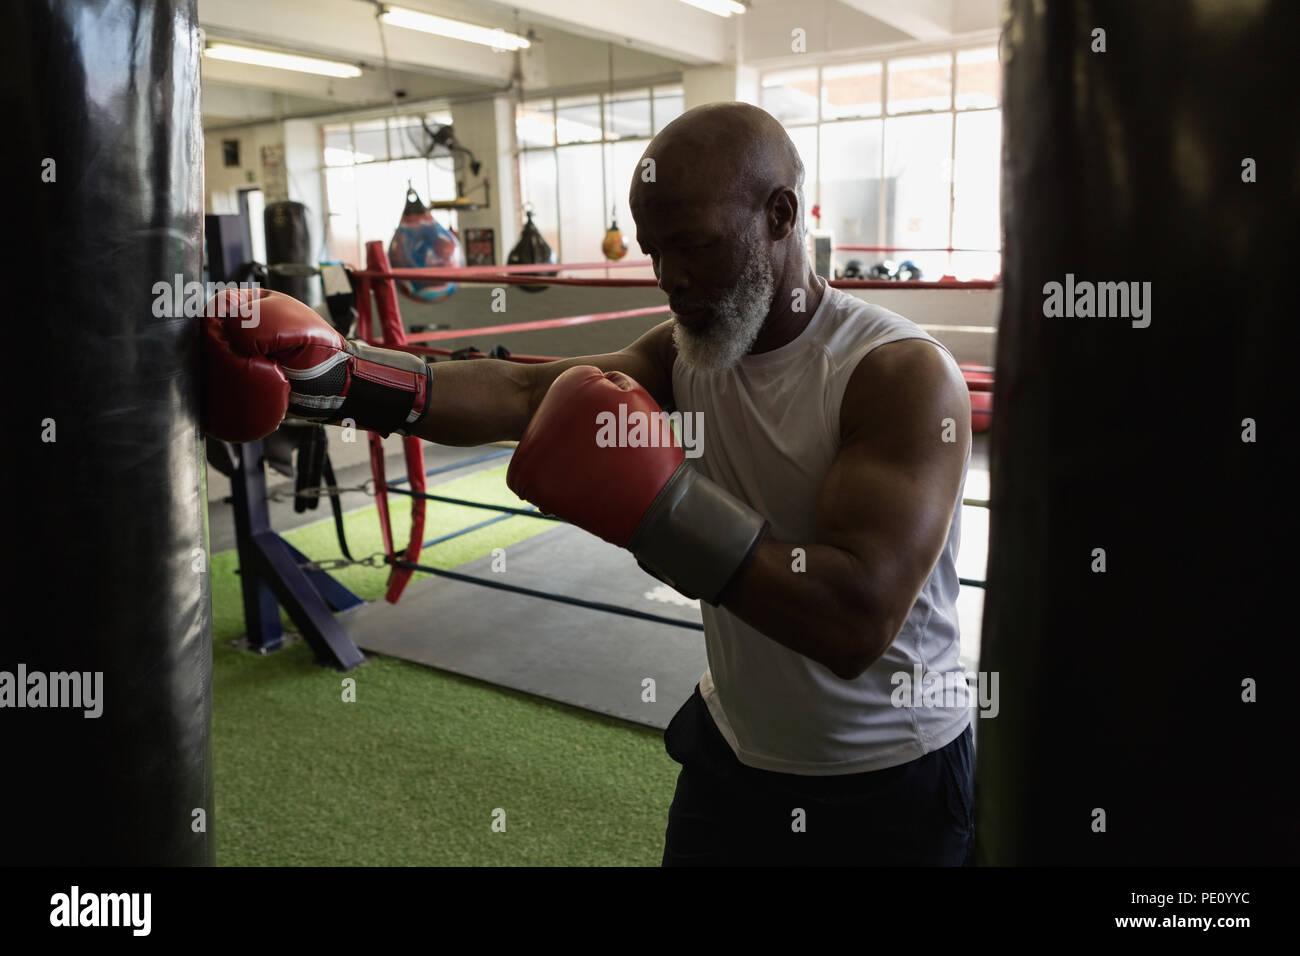 Senior man practicing boxing on the punching bag - Stock Image